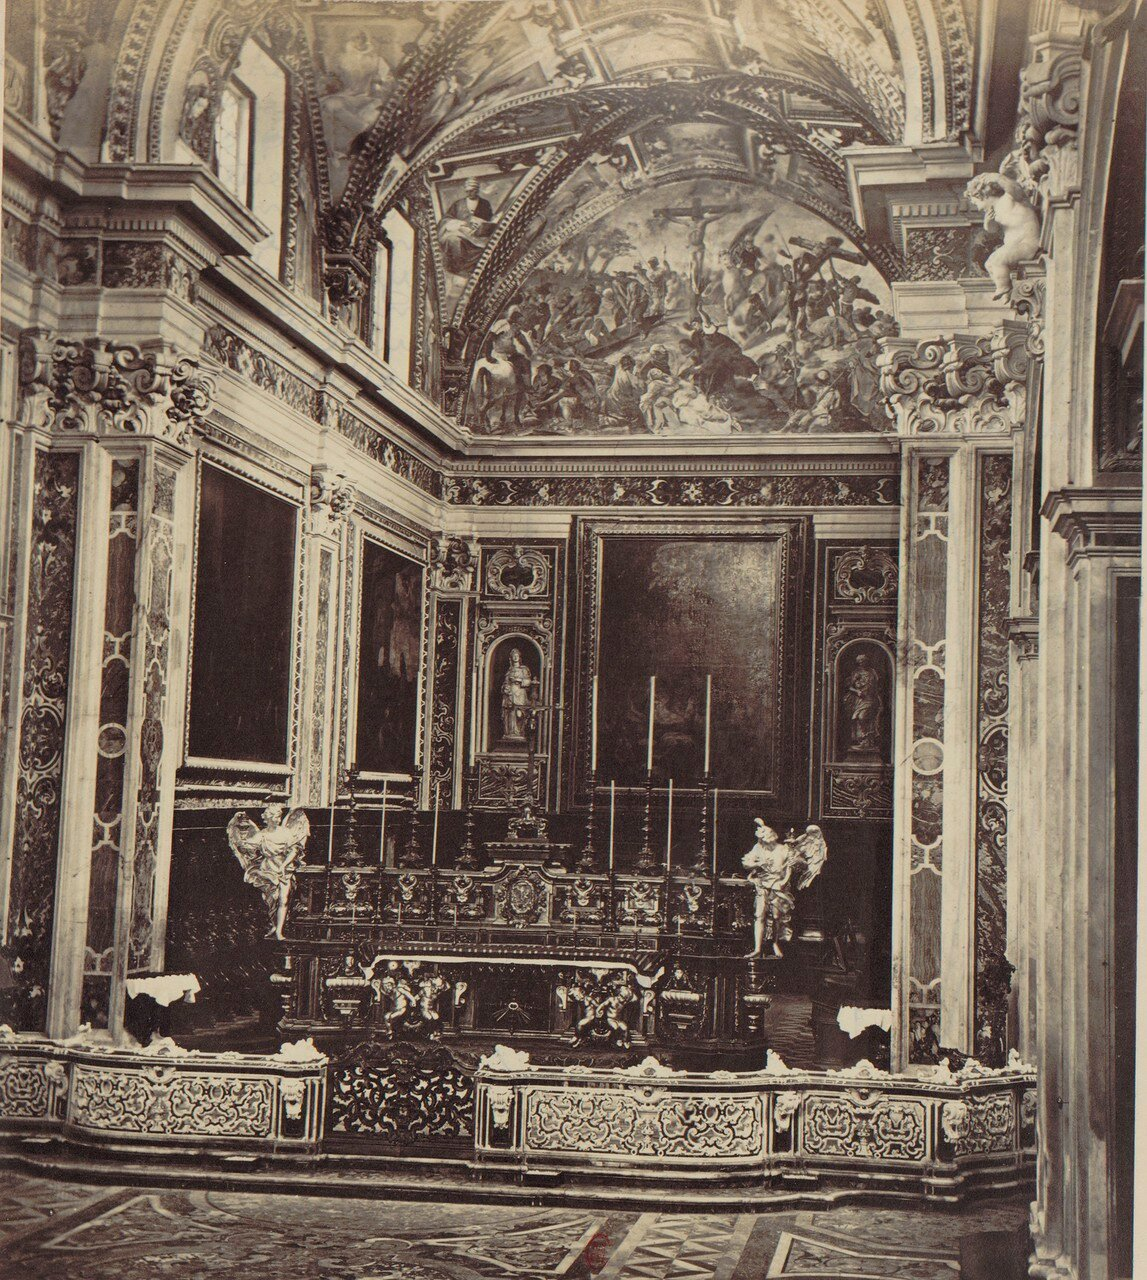 65. Картезианский монастырь святого Мартина. Интерьер церкви